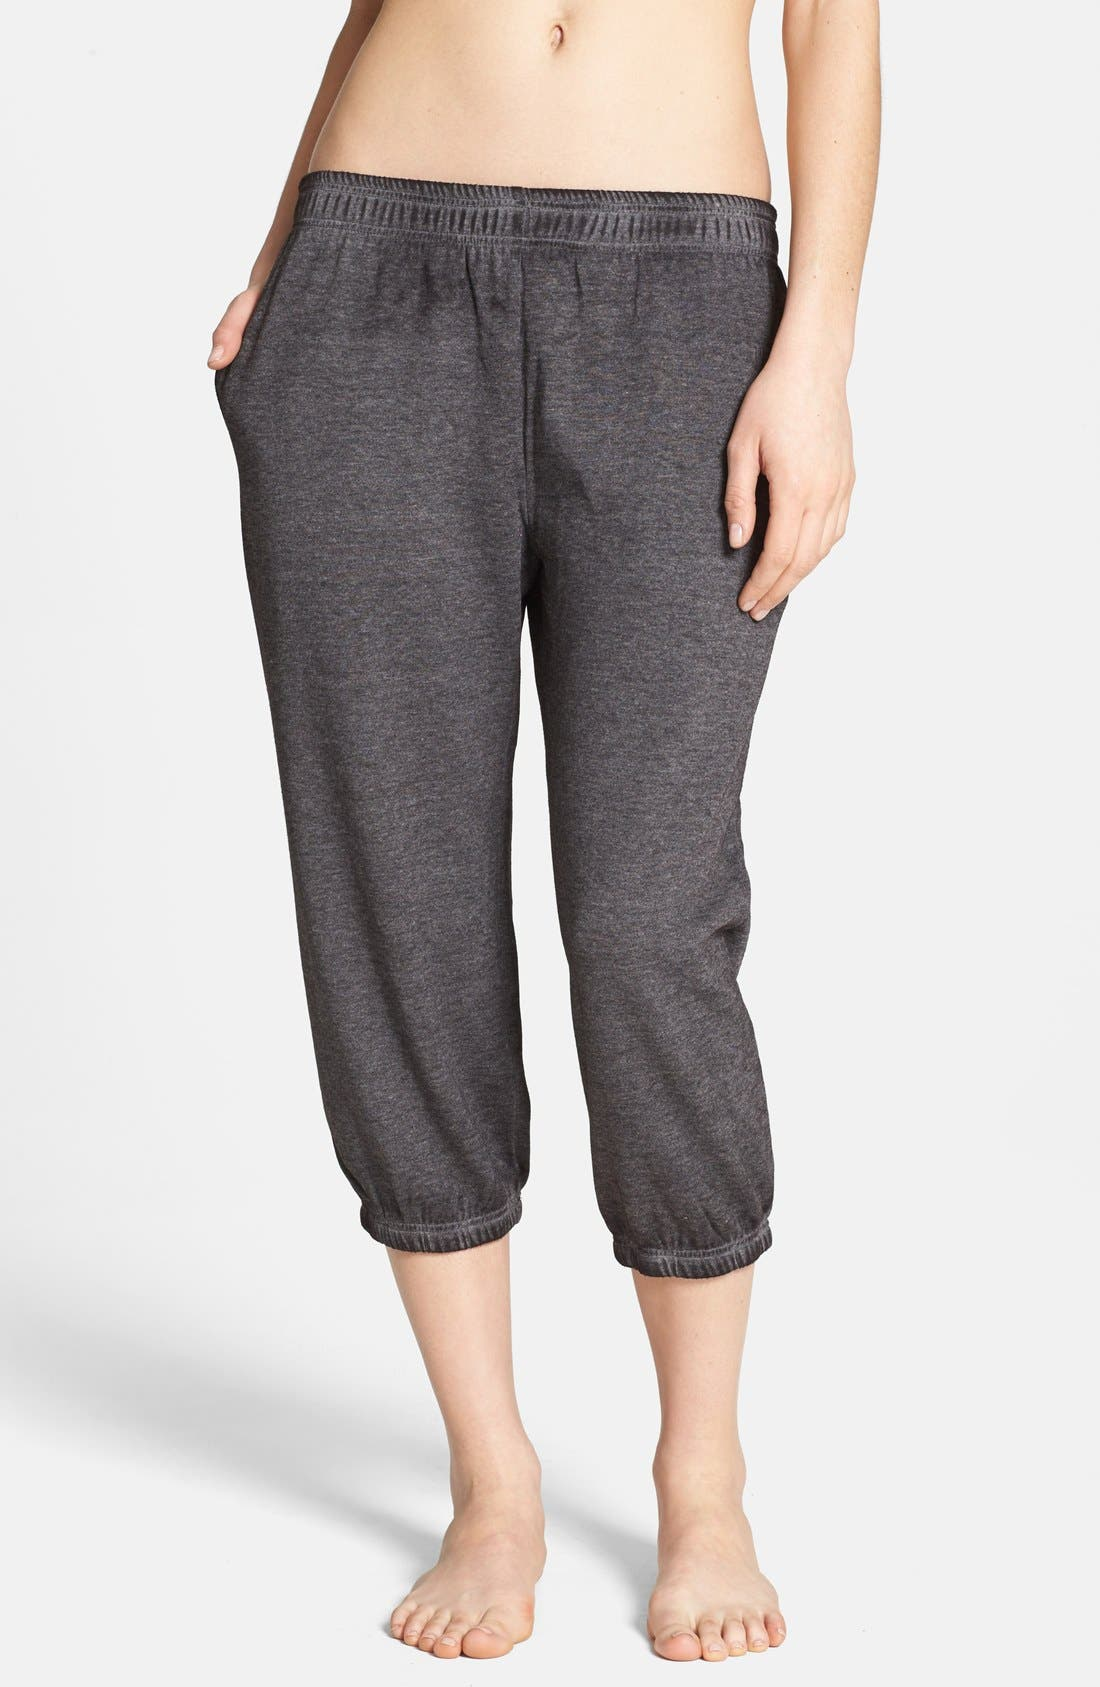 Alternate Image 1 Selected - BP. Undercover 'Gym Class' Crop Sweatpants (Juniors)